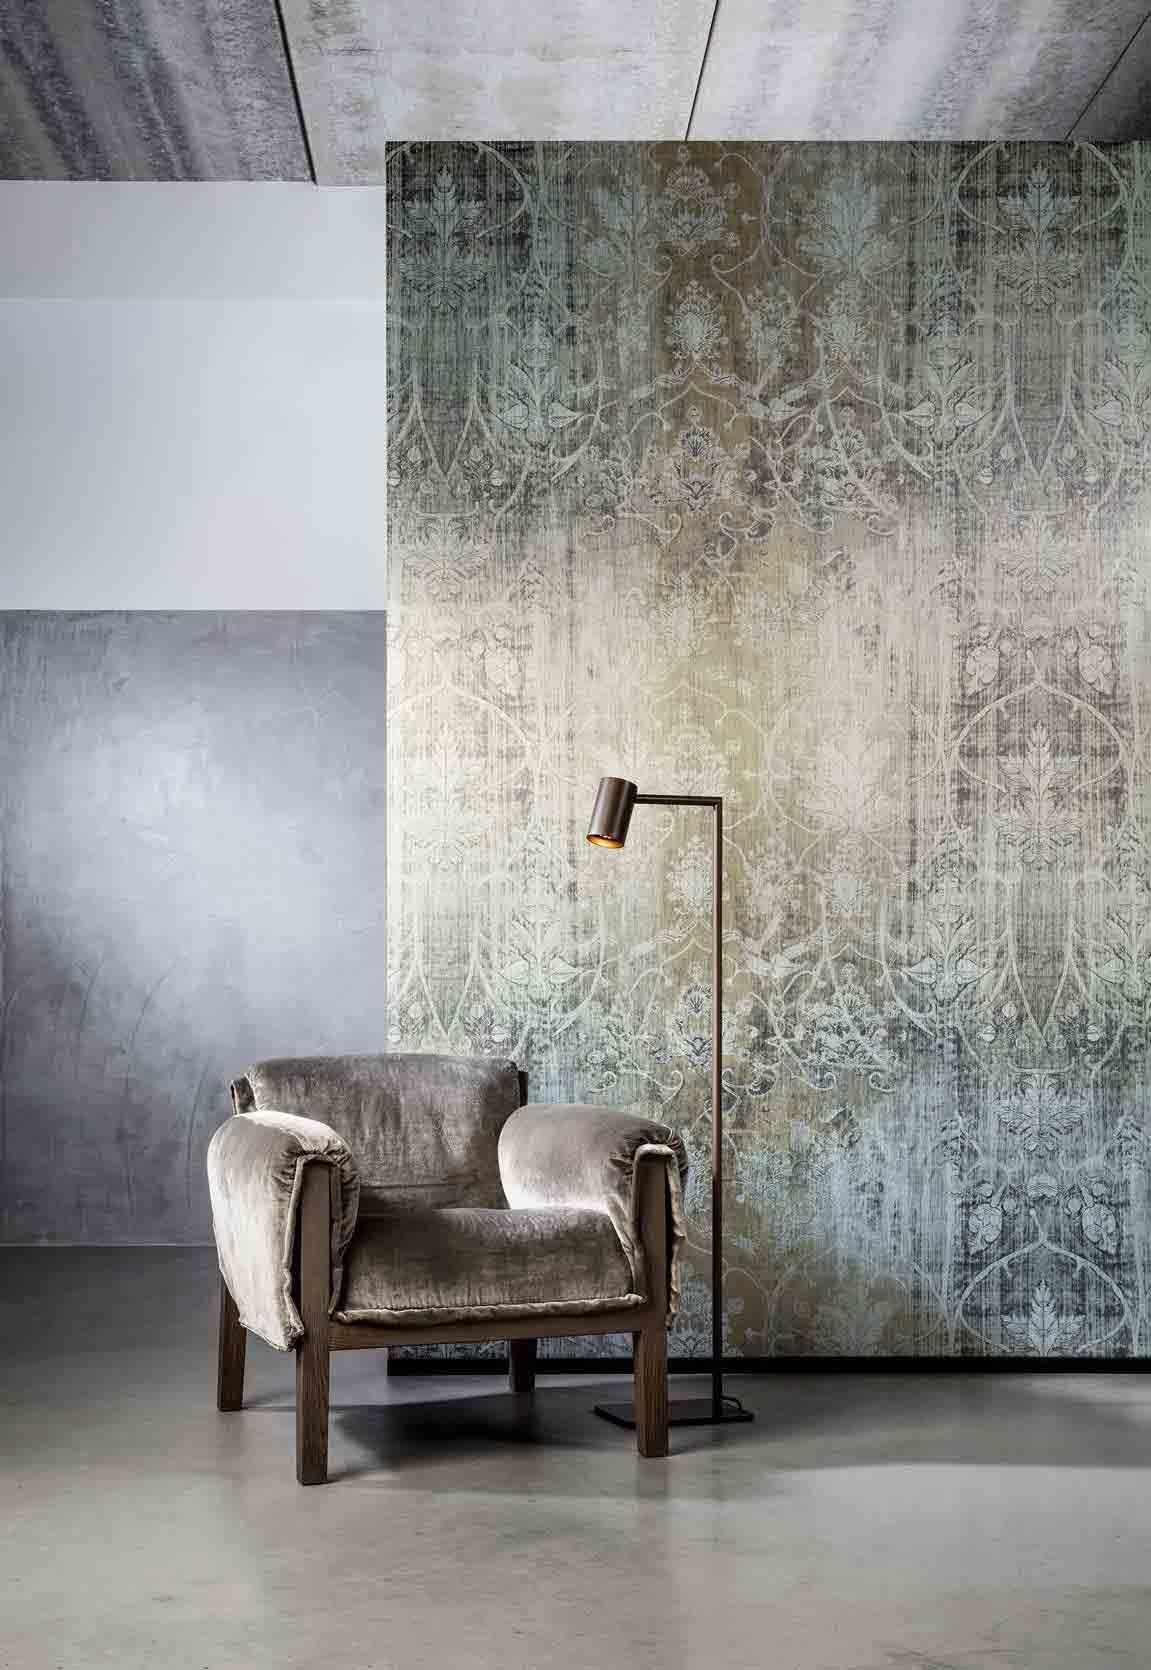 Behang | amenajare | Pinterest - Woonkamer behang, Behang ideeën en ...